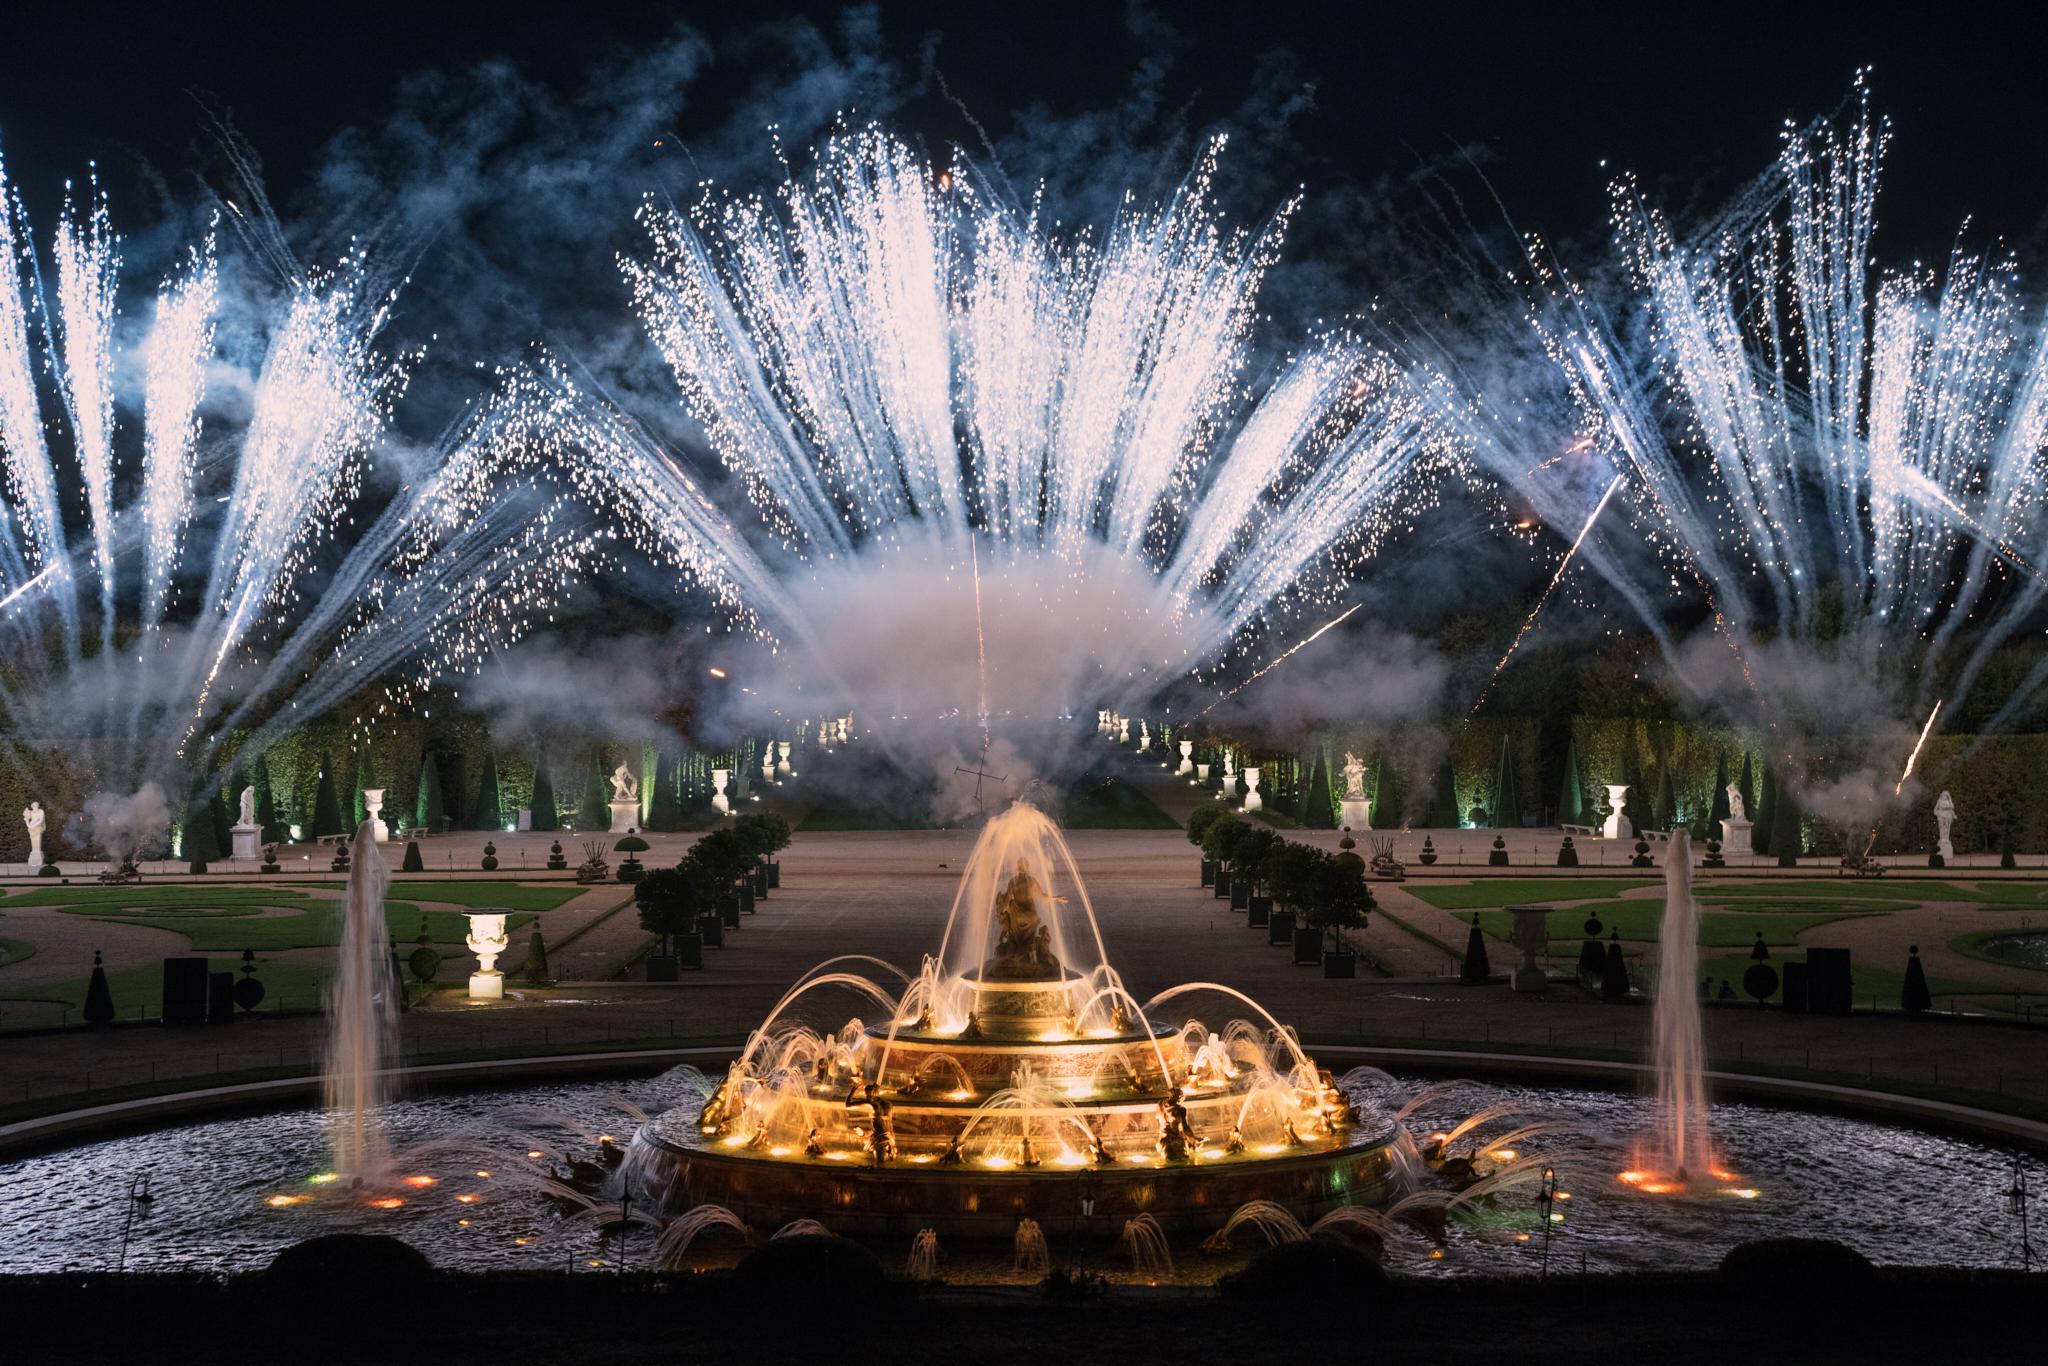 Fireworks, Chateau de Versailles  Sony A7rIII, Sony 24-70mm f2.8 GM